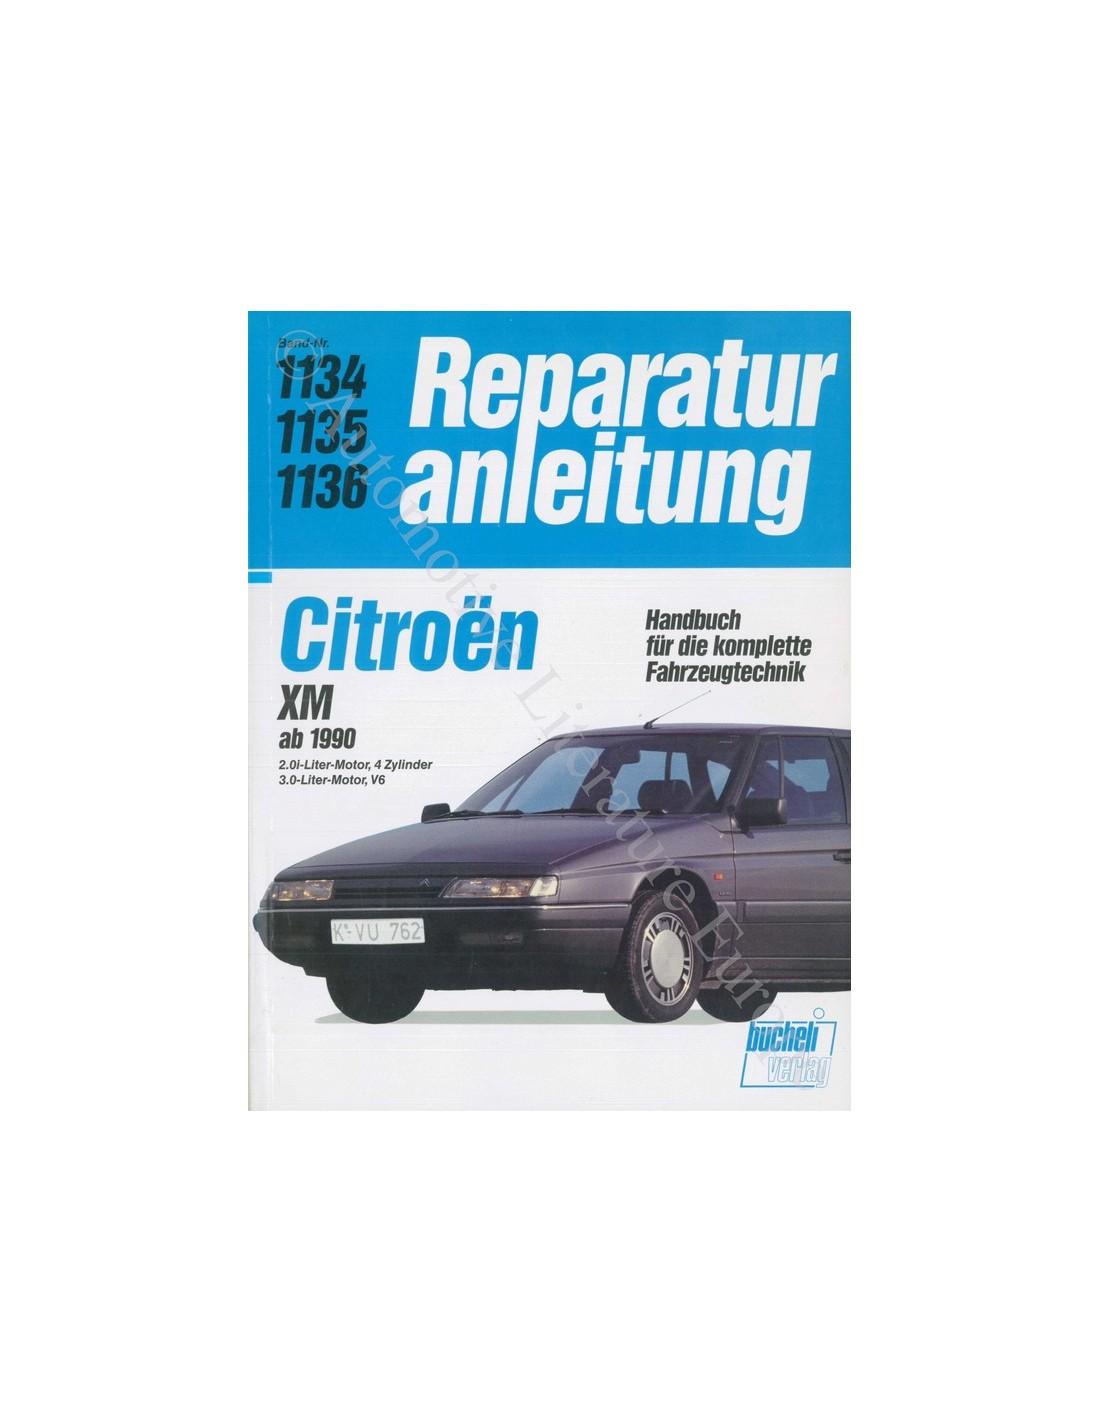 1990 1995 citroen xm repair manual german rh autolit eu 2015 Mazda CX-5 Mazda SUV